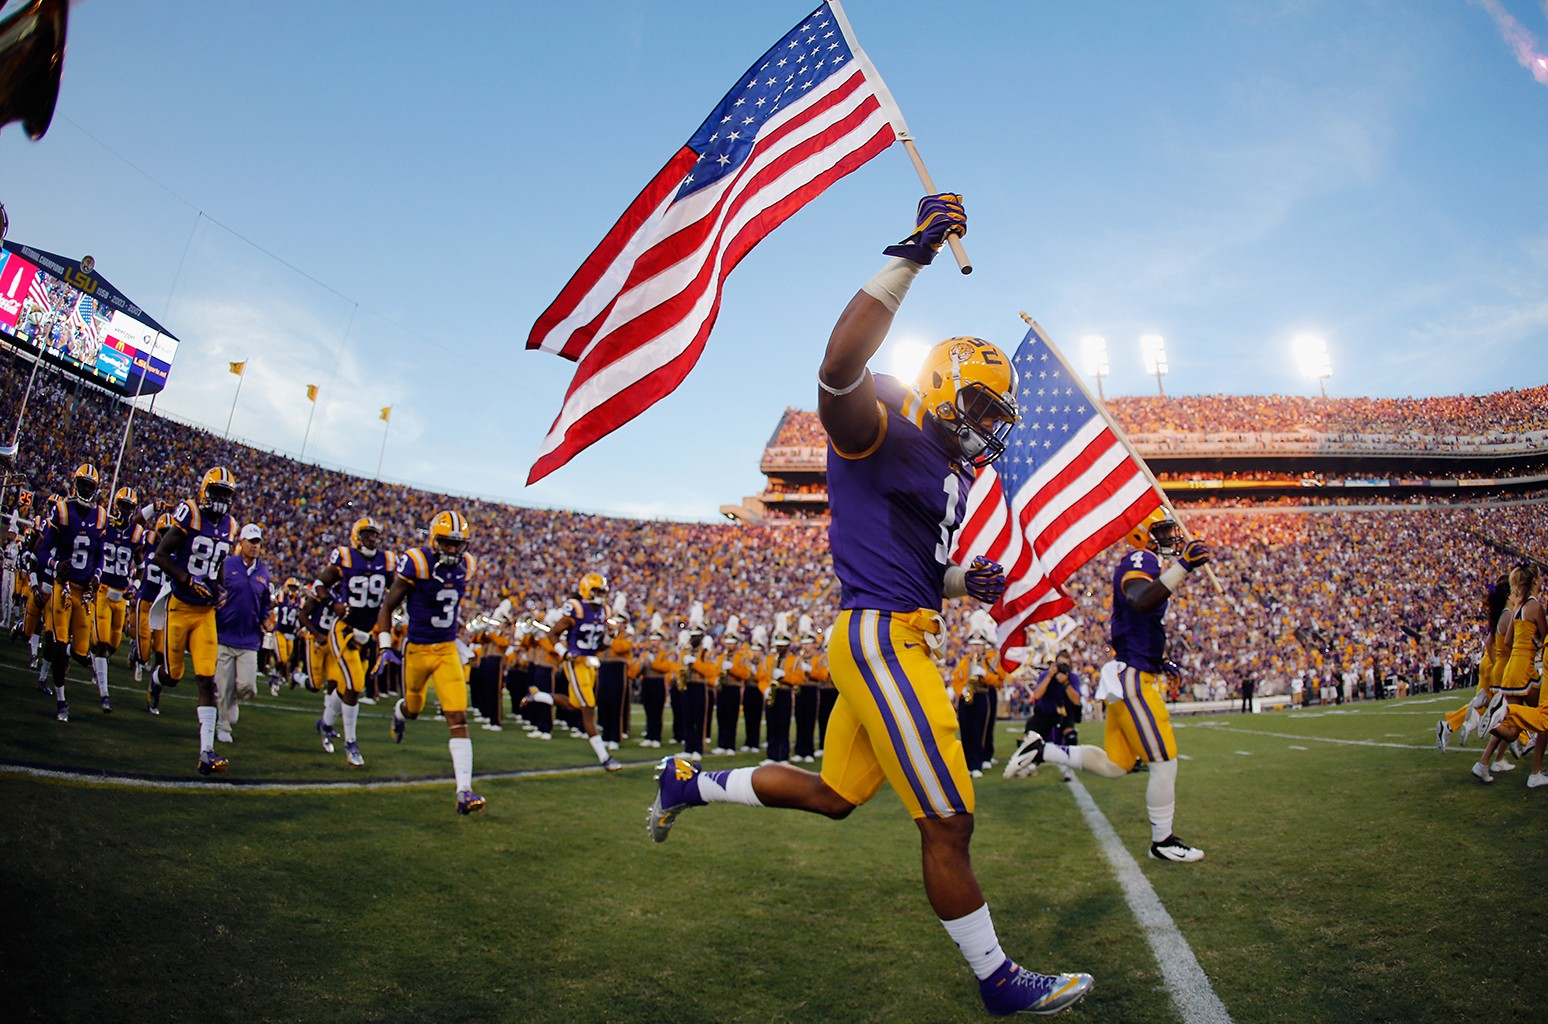 American flag during a footballl game